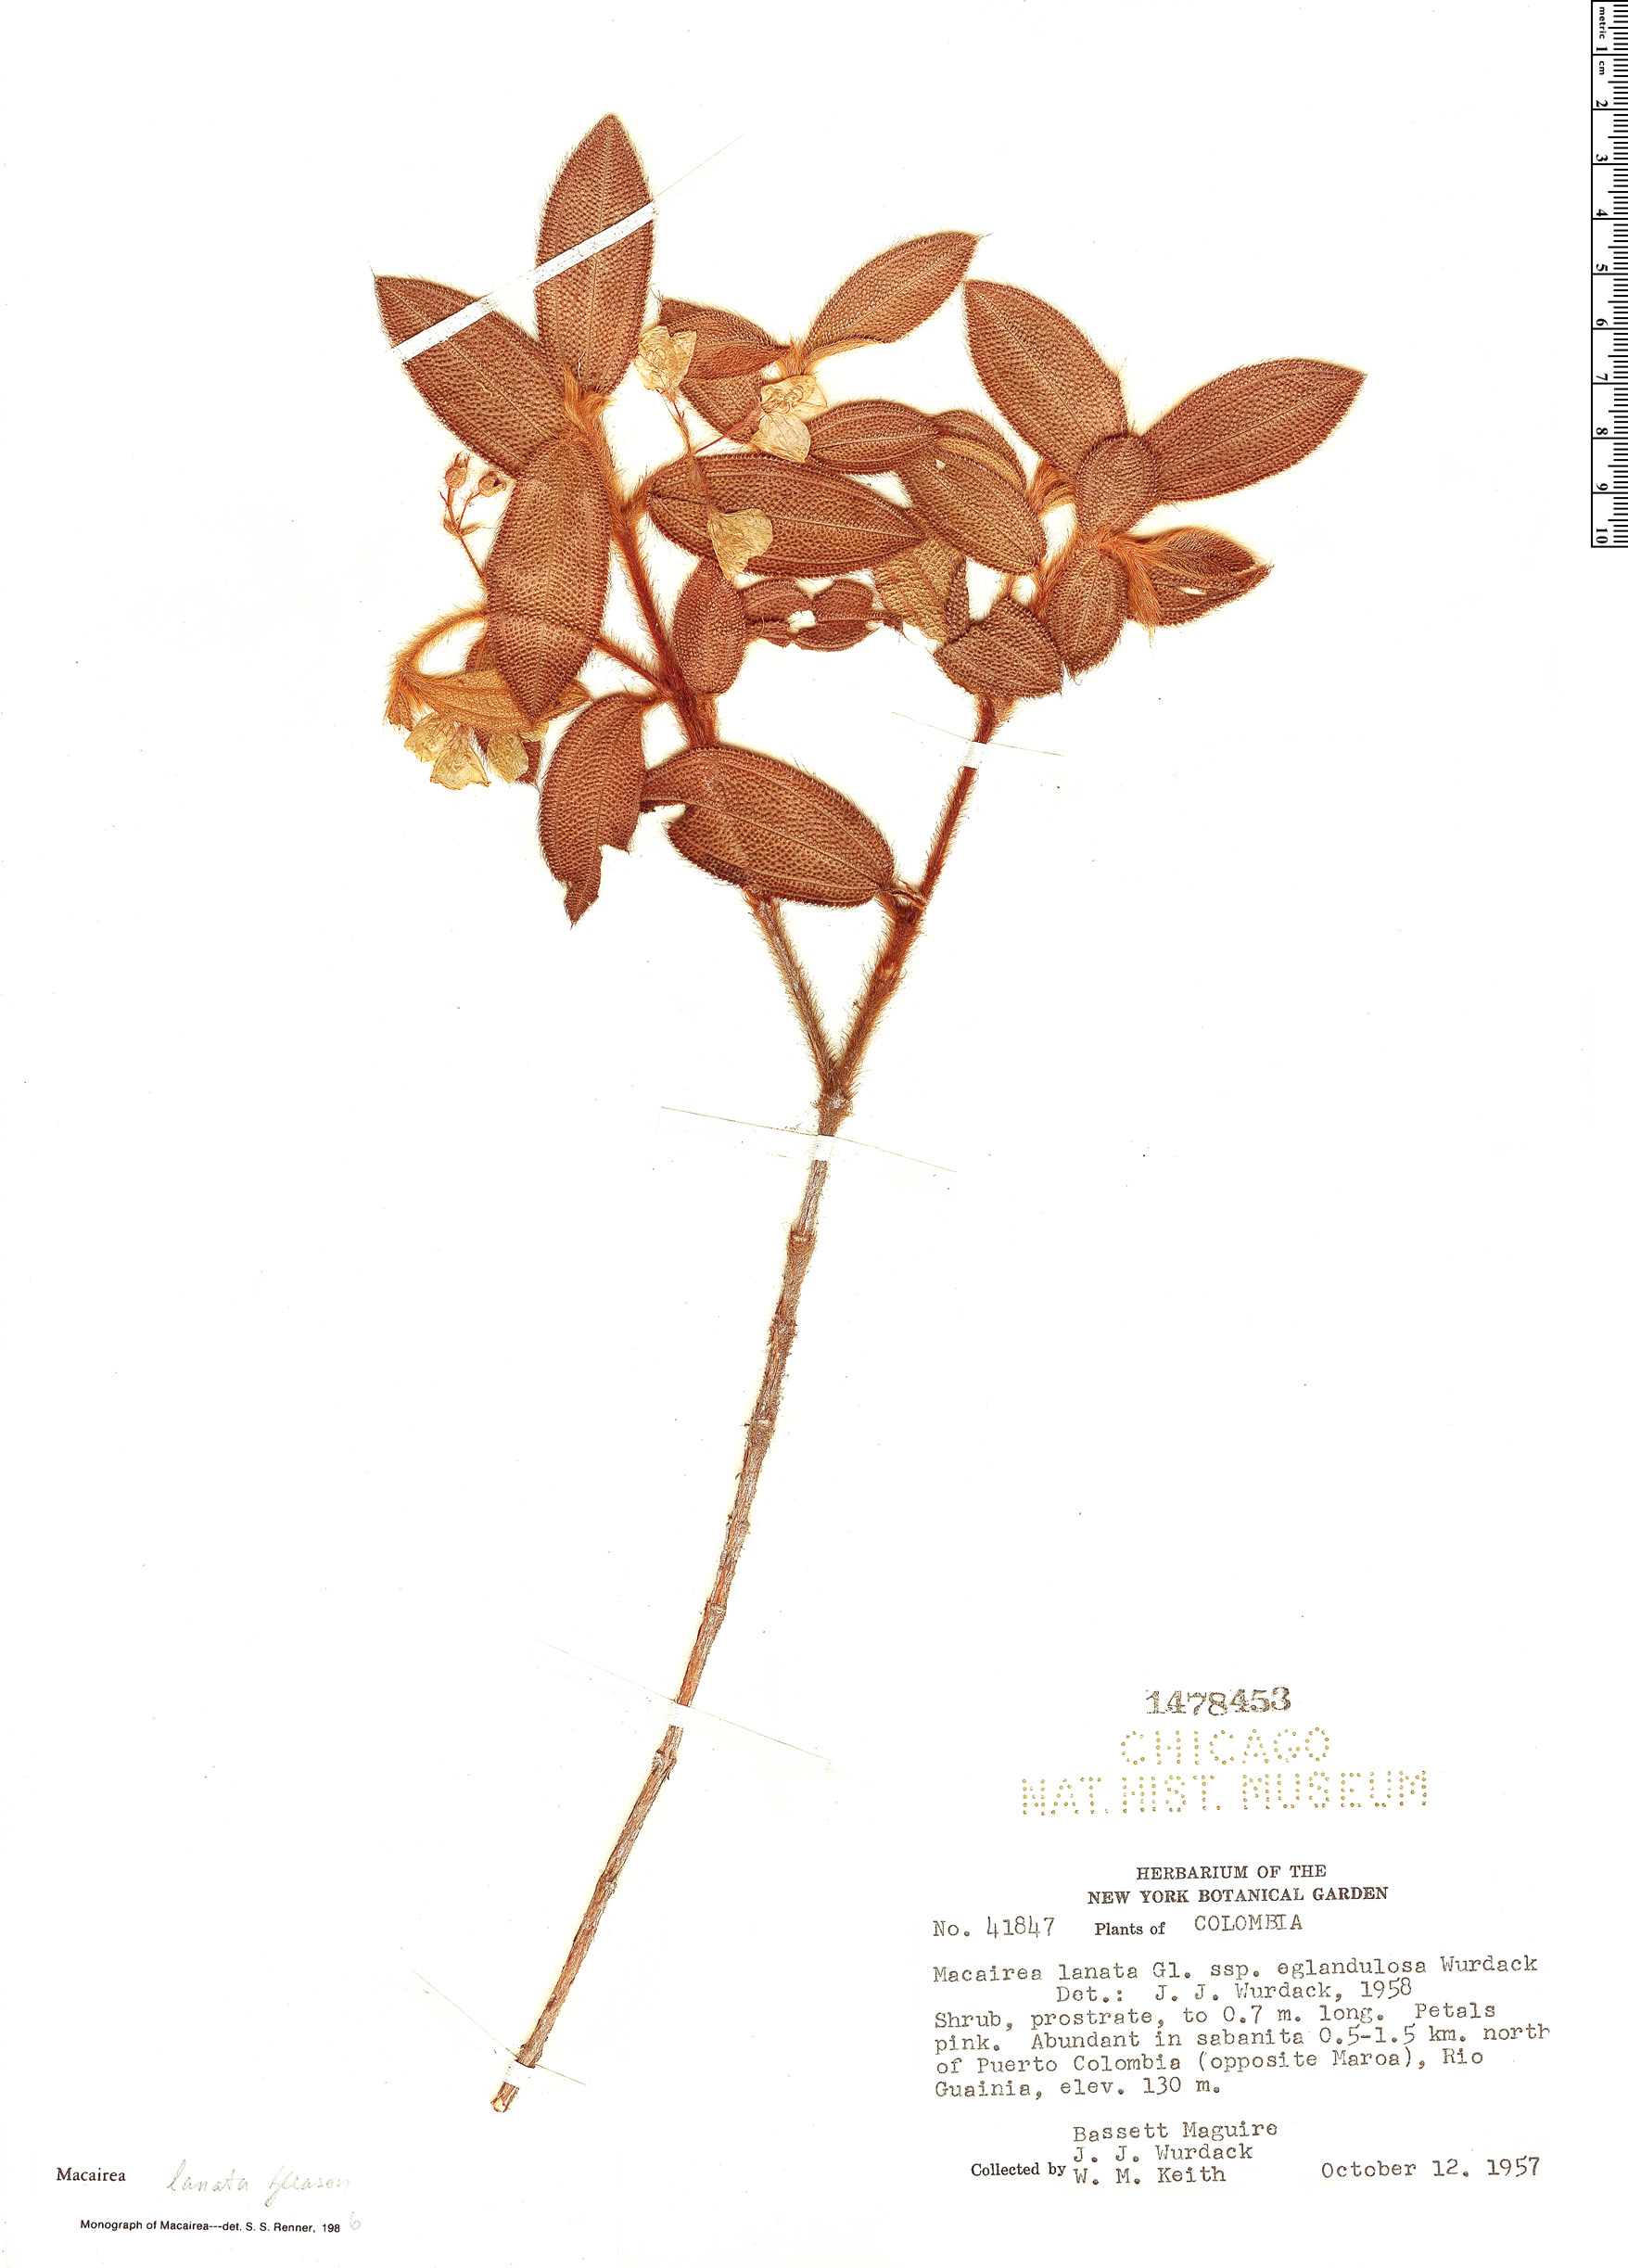 Specimen: Macairea lanata